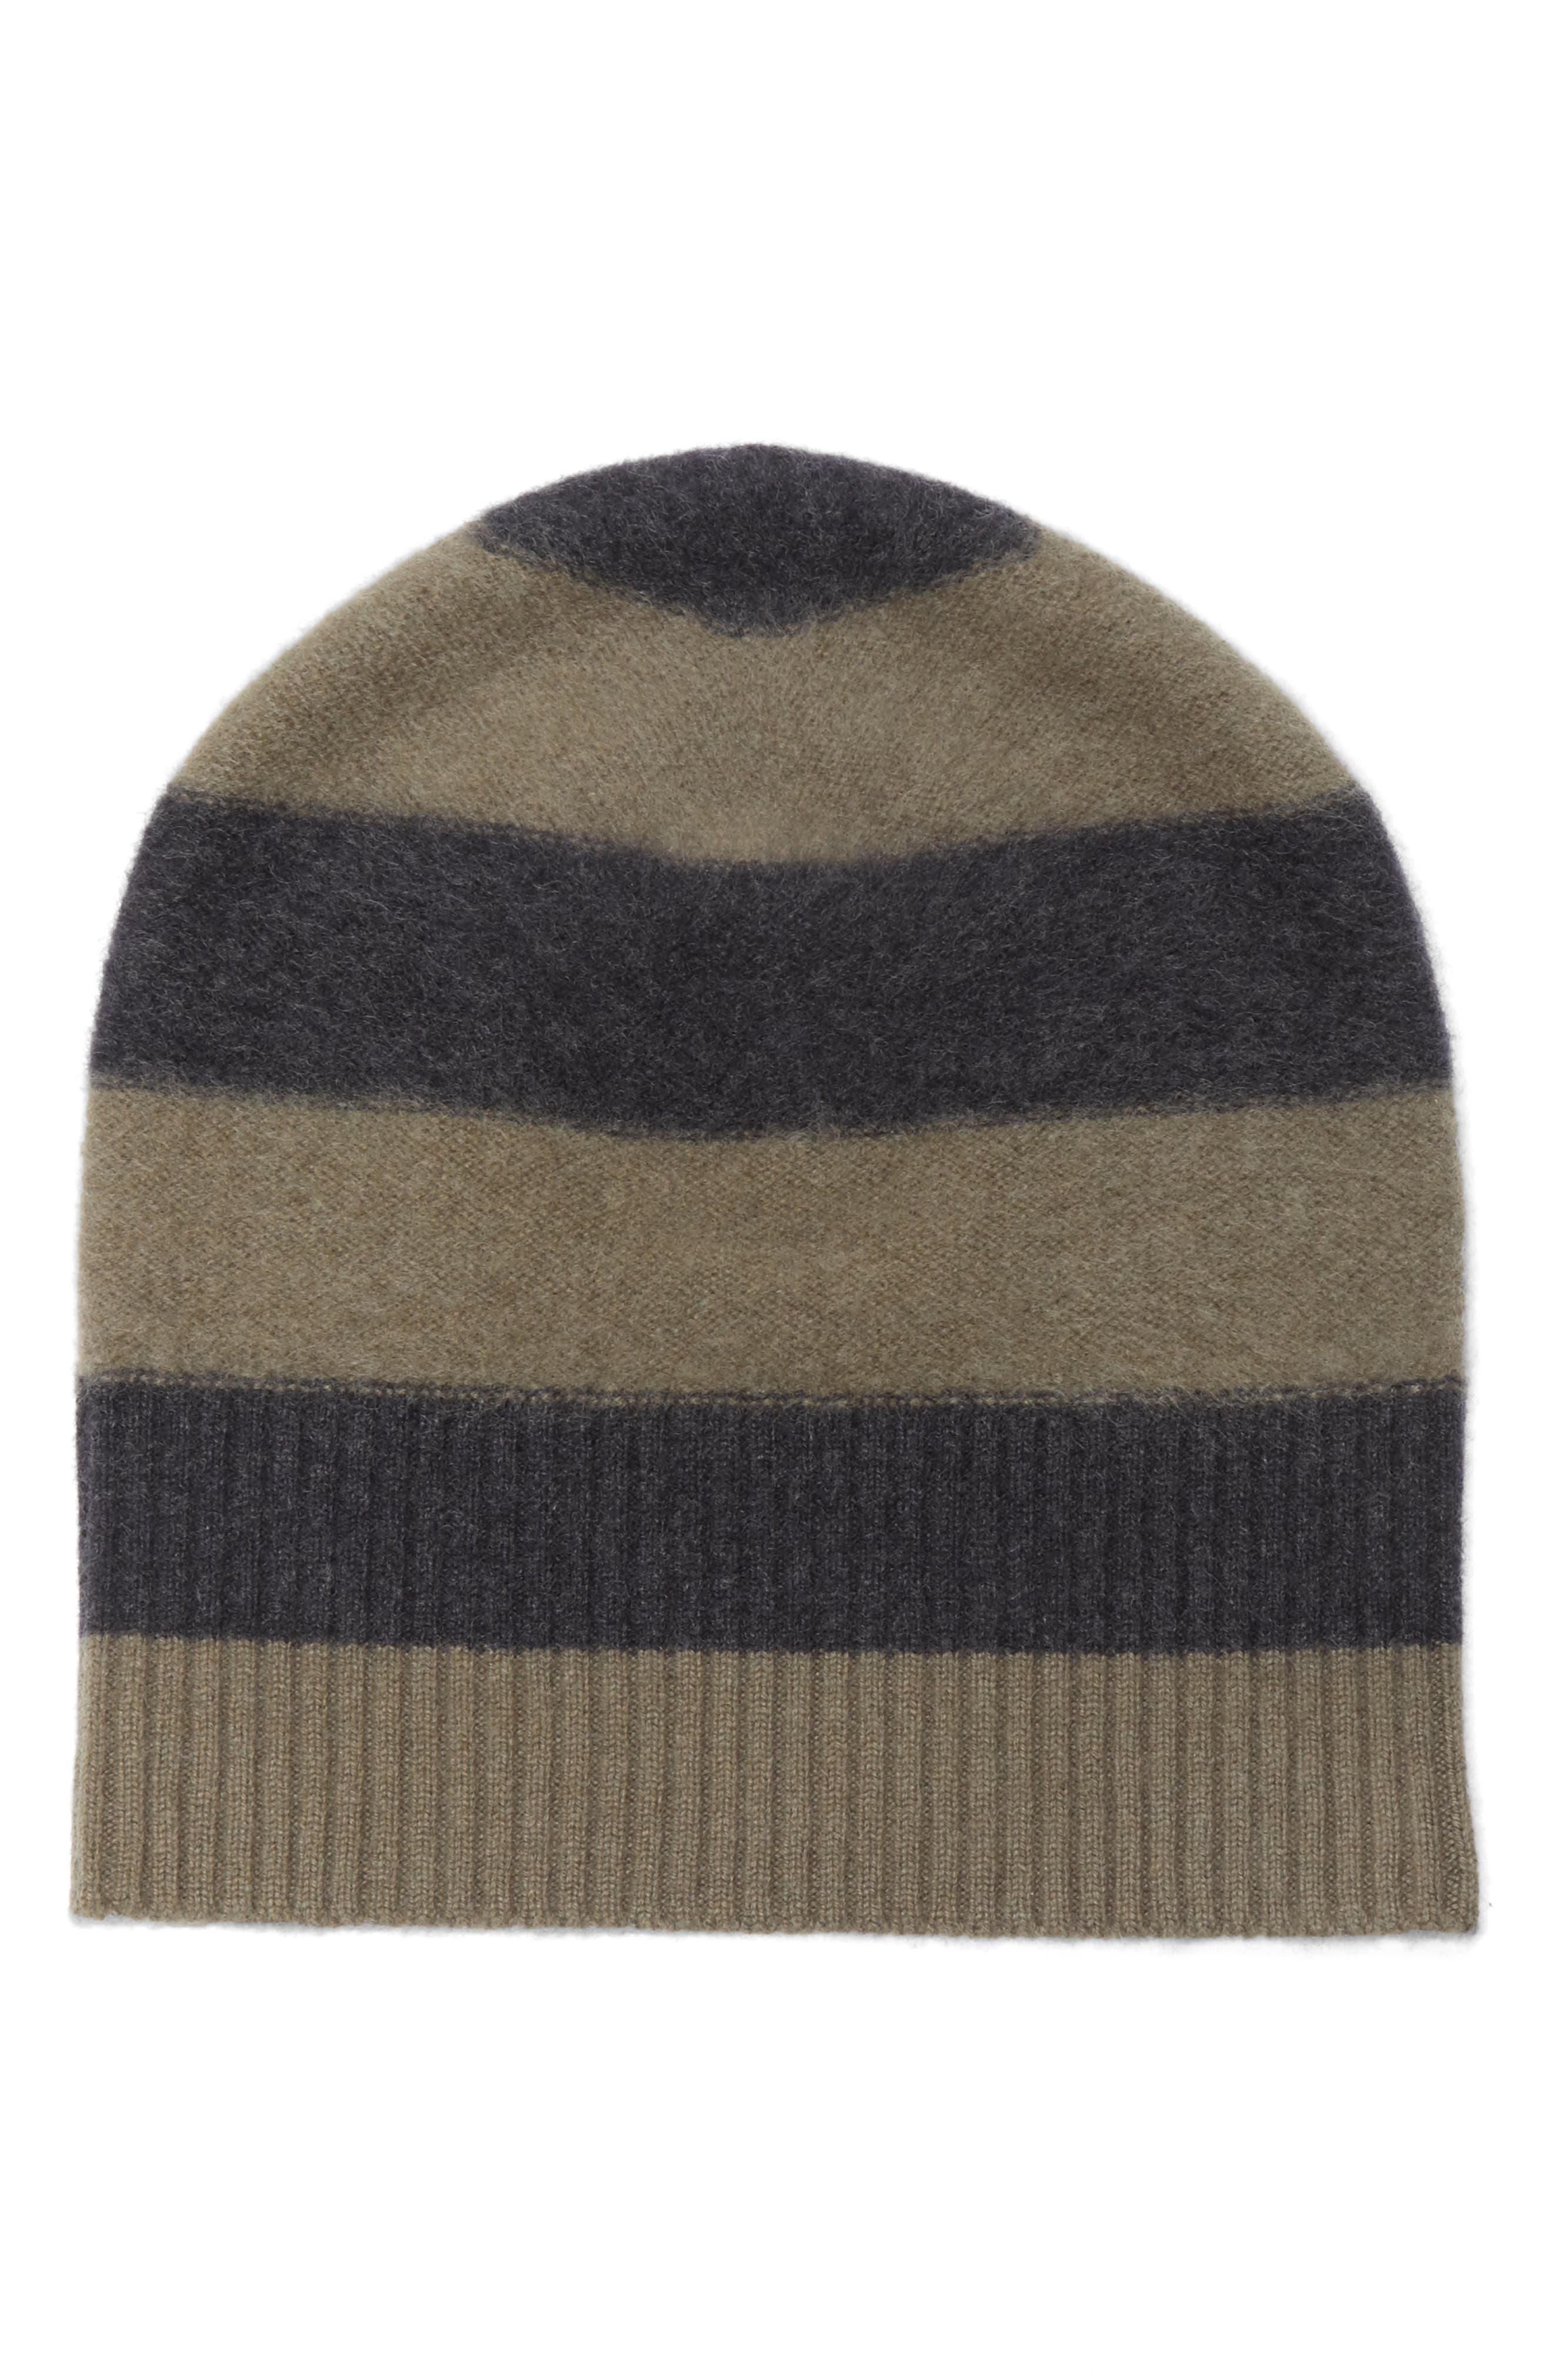 Stripe Cashmere Beanie,                             Main thumbnail 1, color,                             357